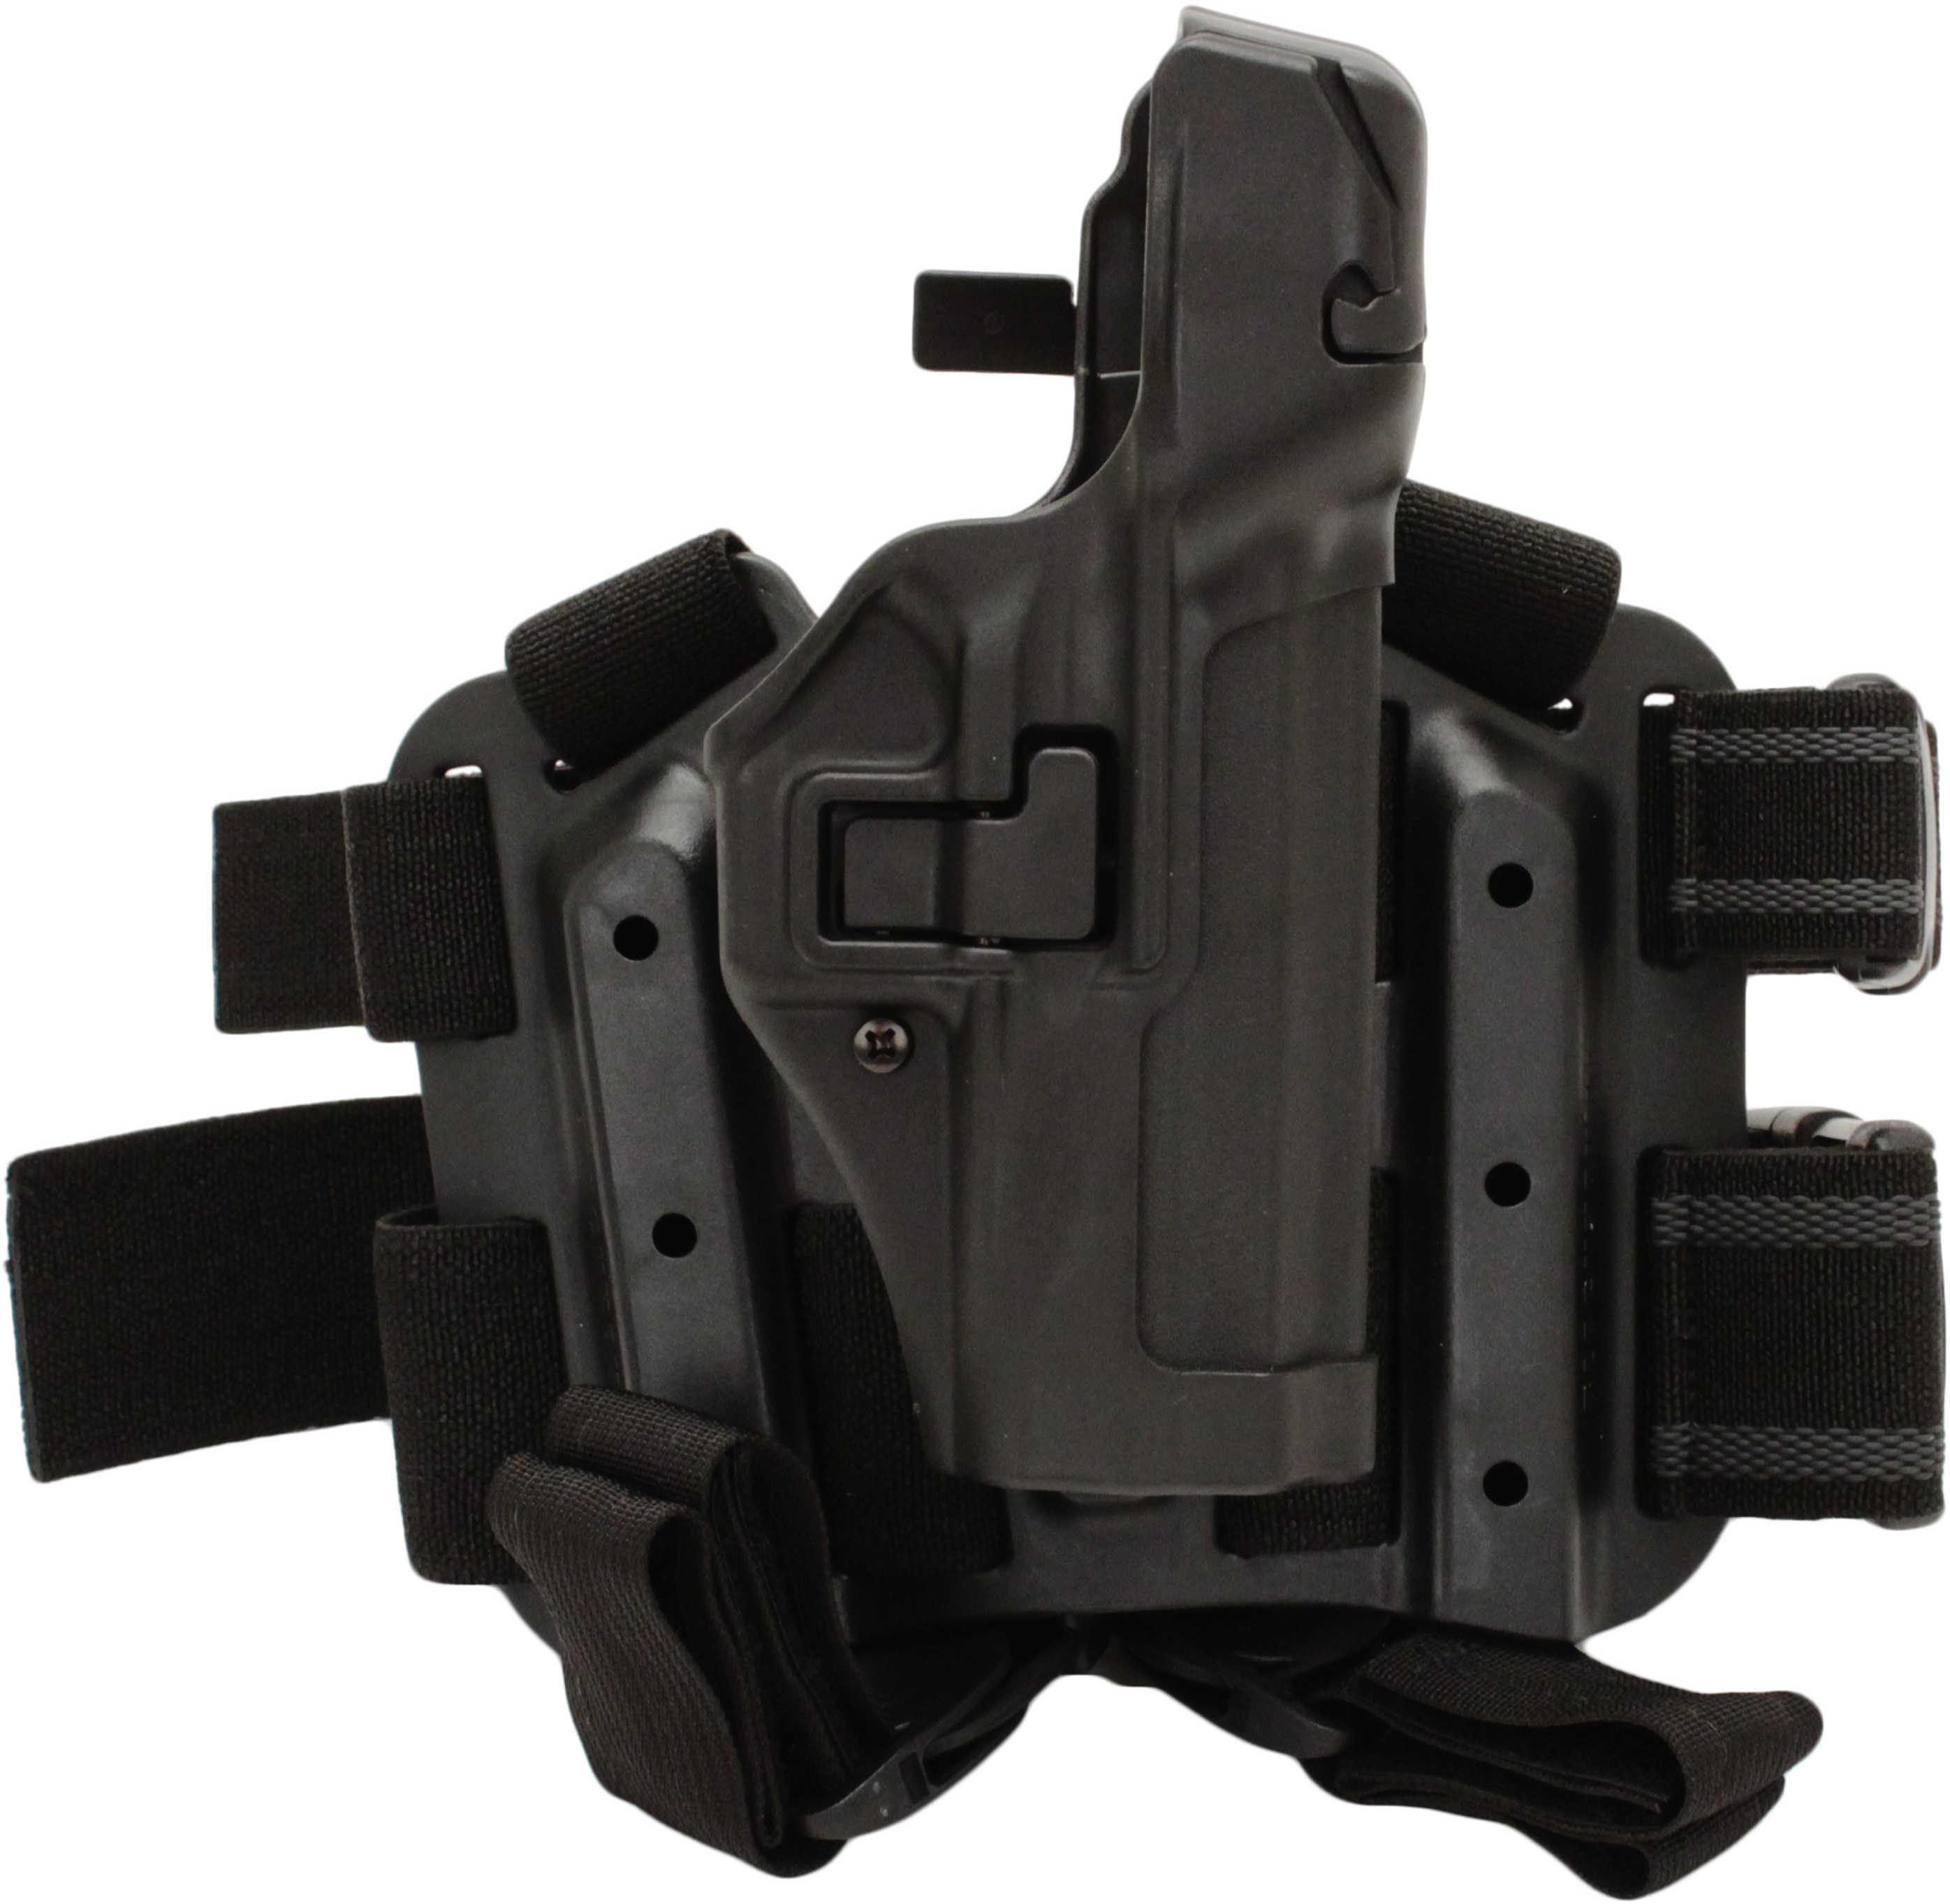 BlackHawk Serpa Tactical Level 3 Right Hand M&P 9/40 Md: 430625BK-R